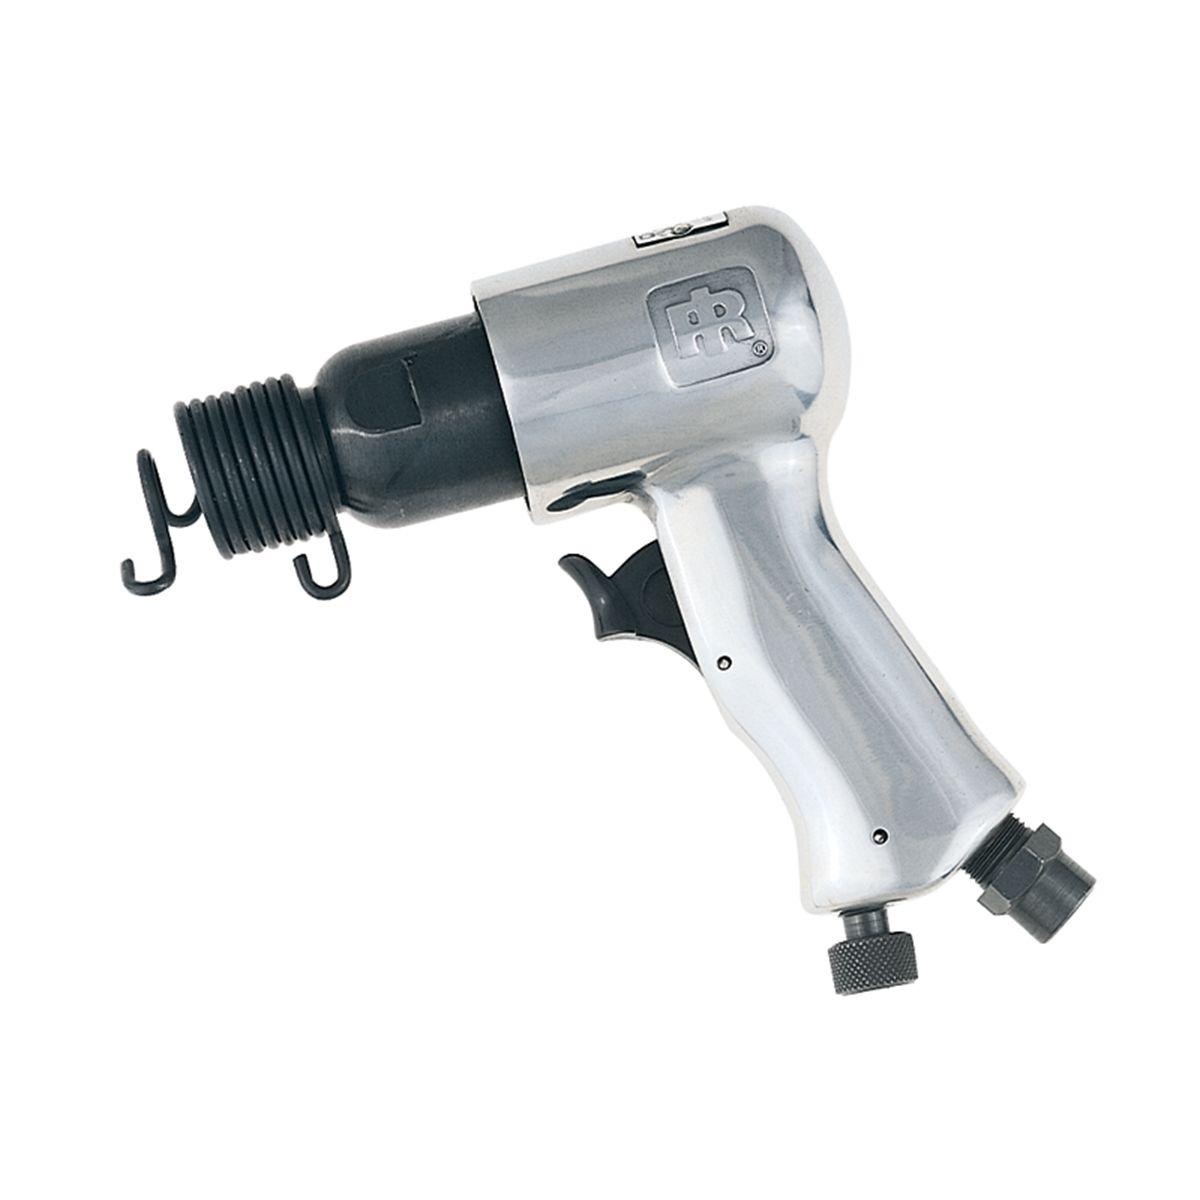 Best Hammer Punch Air Tool Accessory 1in Dia Pneumatic Bit Auto Body Work Repair